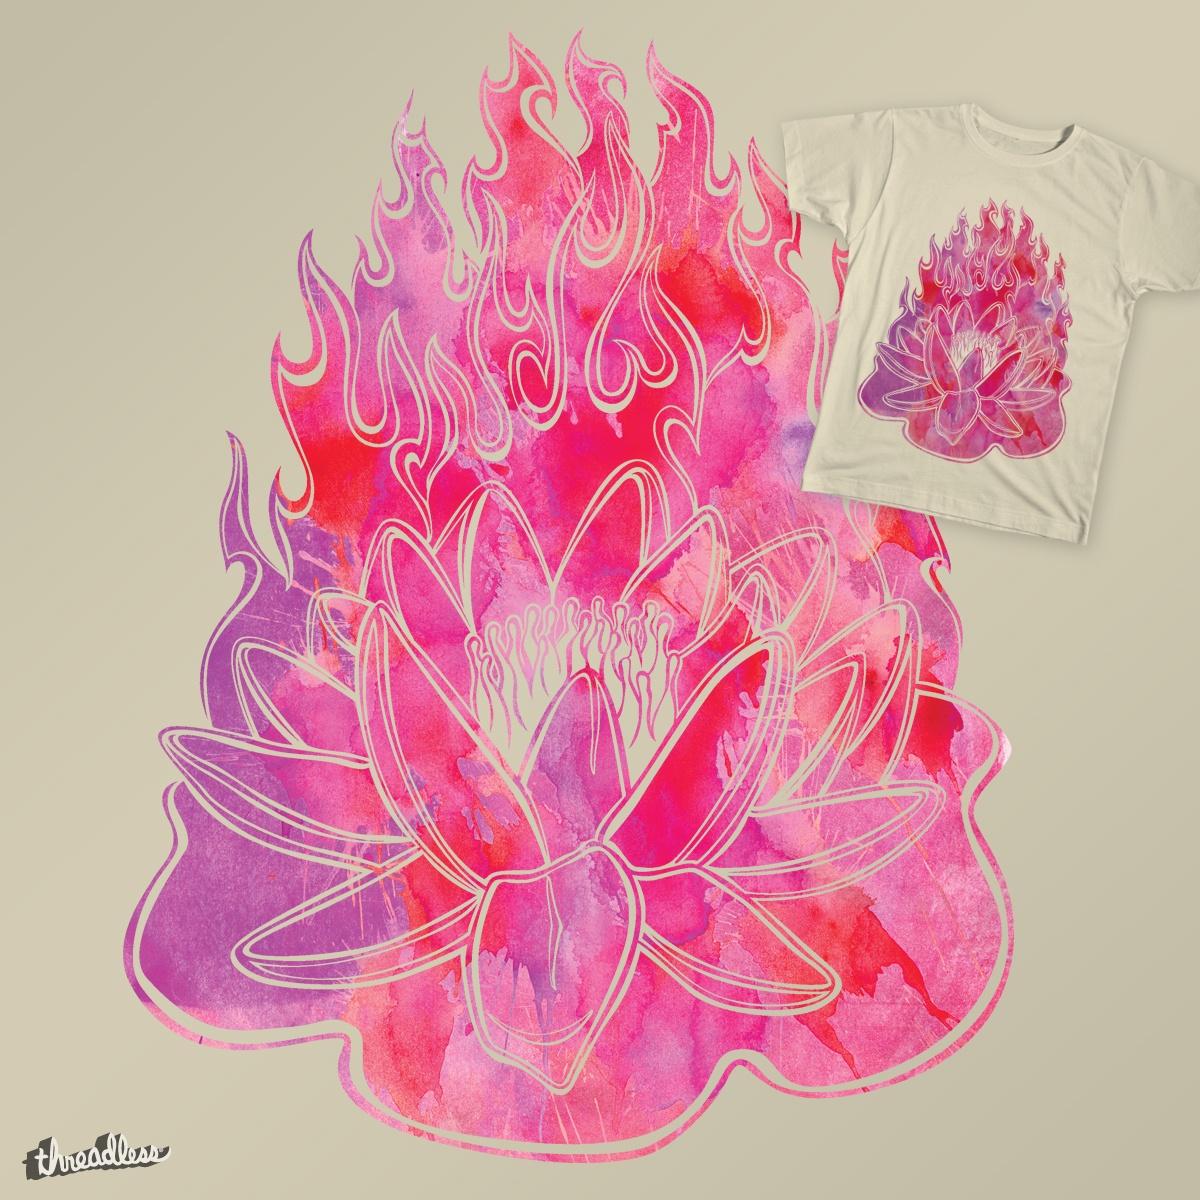 Lotus Fire by rivetsandink on Threadless